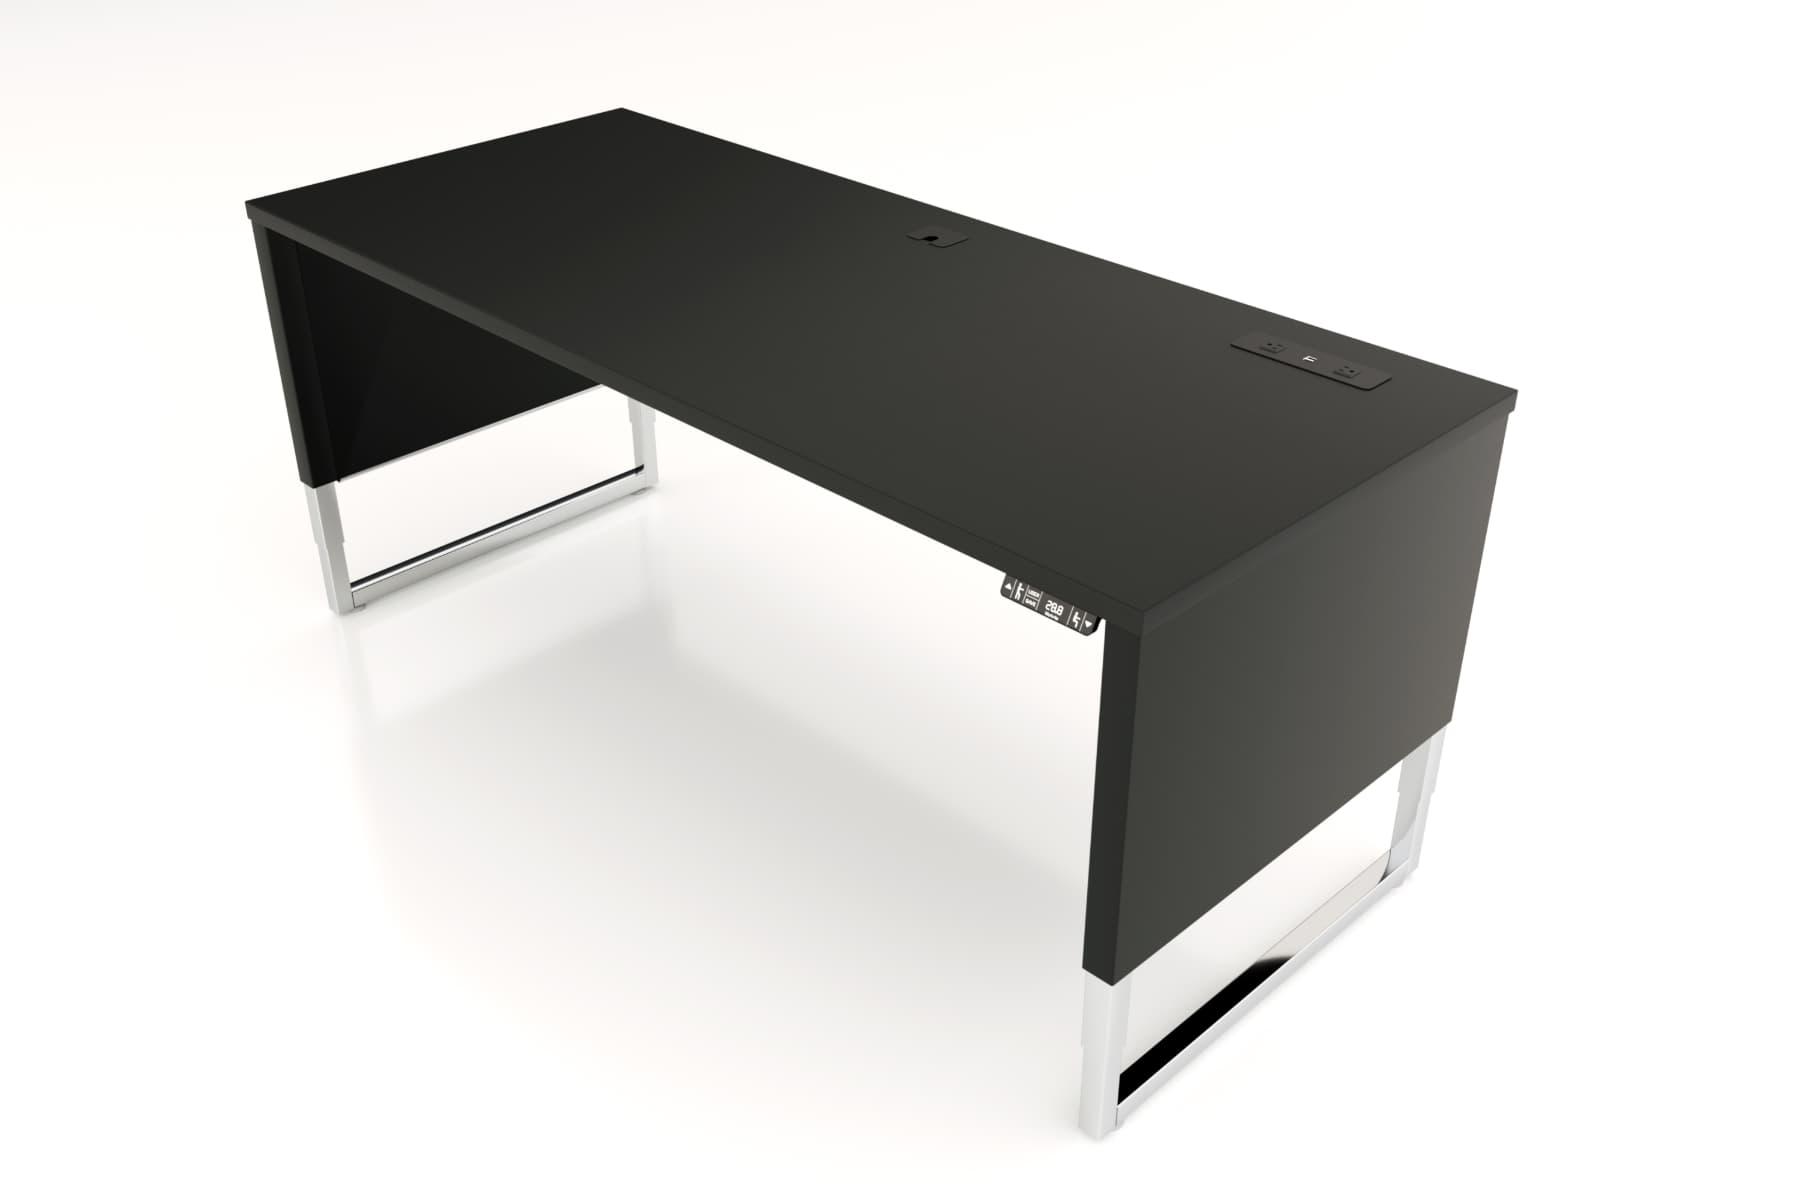 Advent-Desk-ADV-7230-BK-Mid-Front